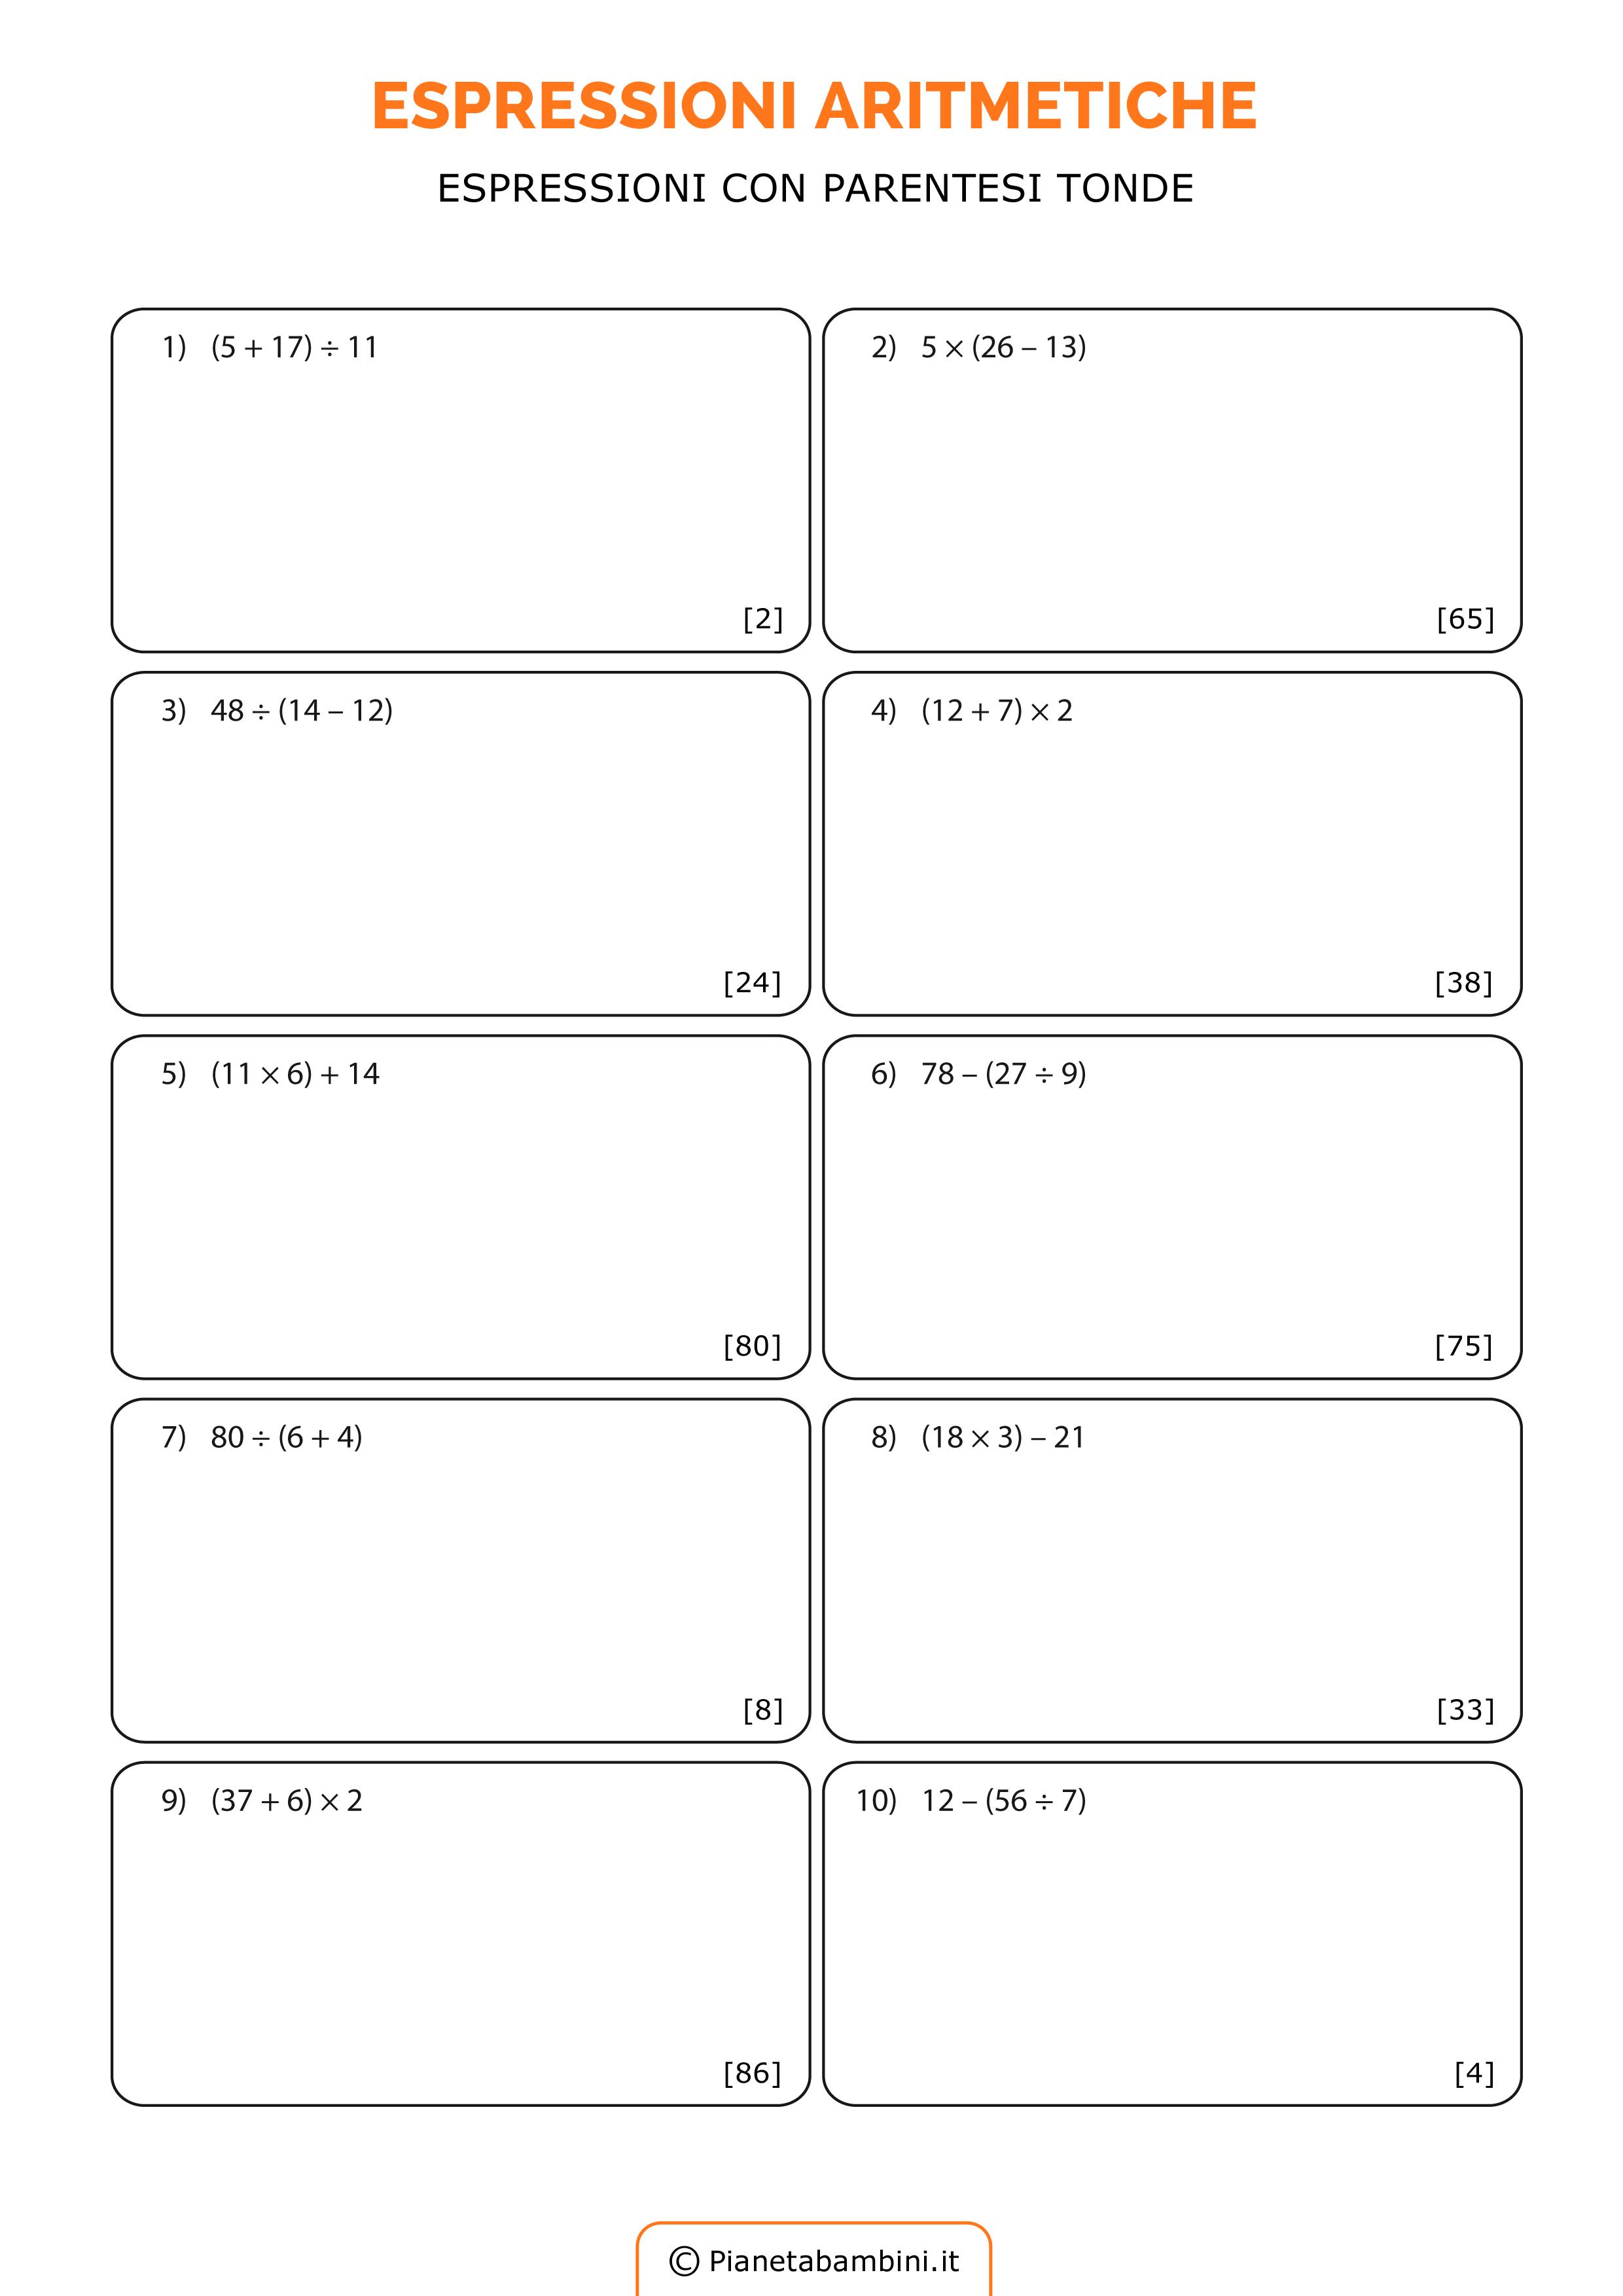 Esercizi-Espressioni-Parentesi_3